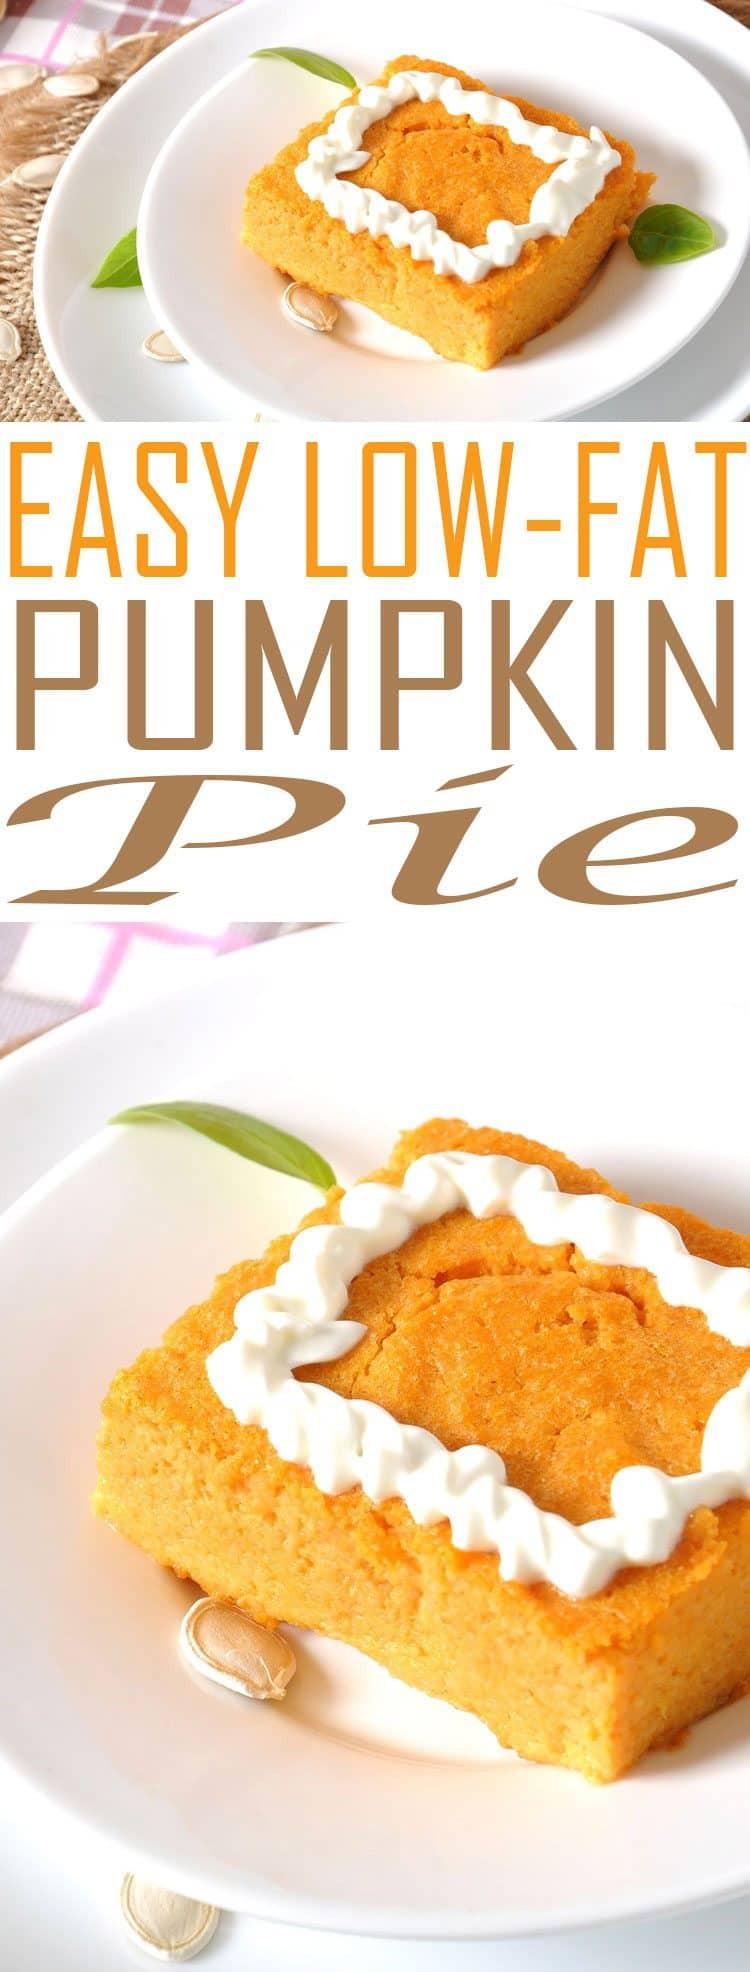 Easy Low Cholesterol Recipes  Weight Watchers Pumpkin Pie Just 1 4 Smart Points Per